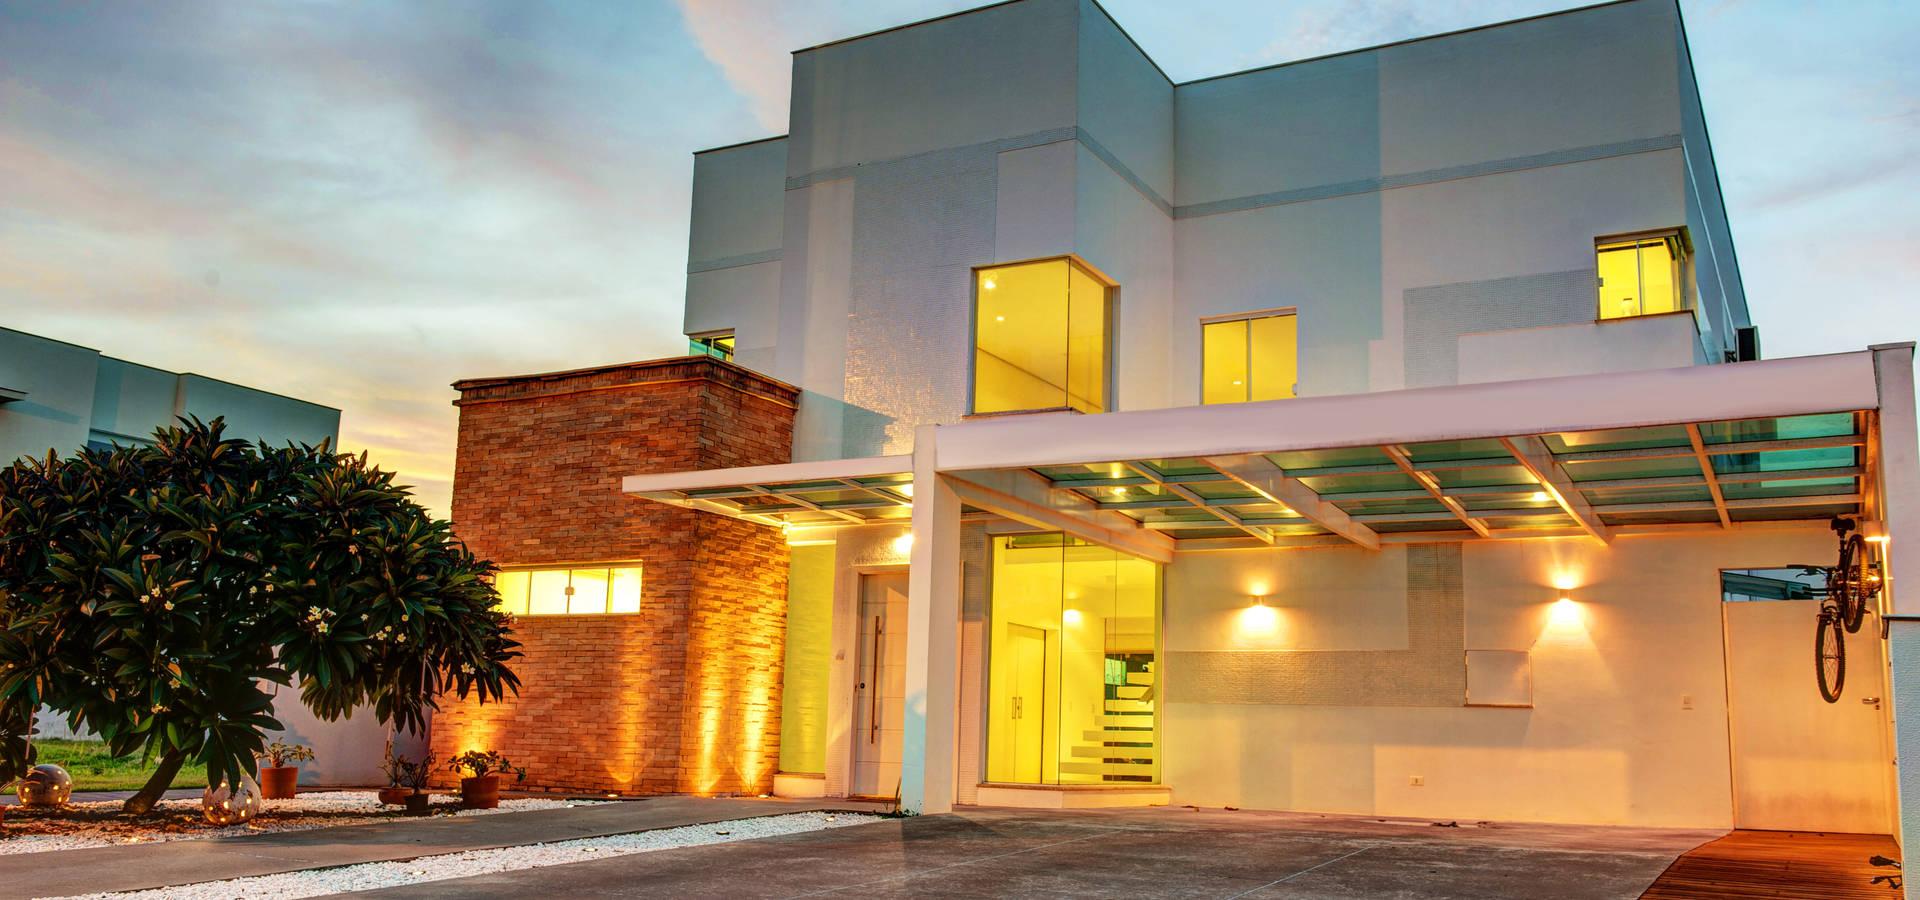 Renato Lincoln – Studio de Arquitetura